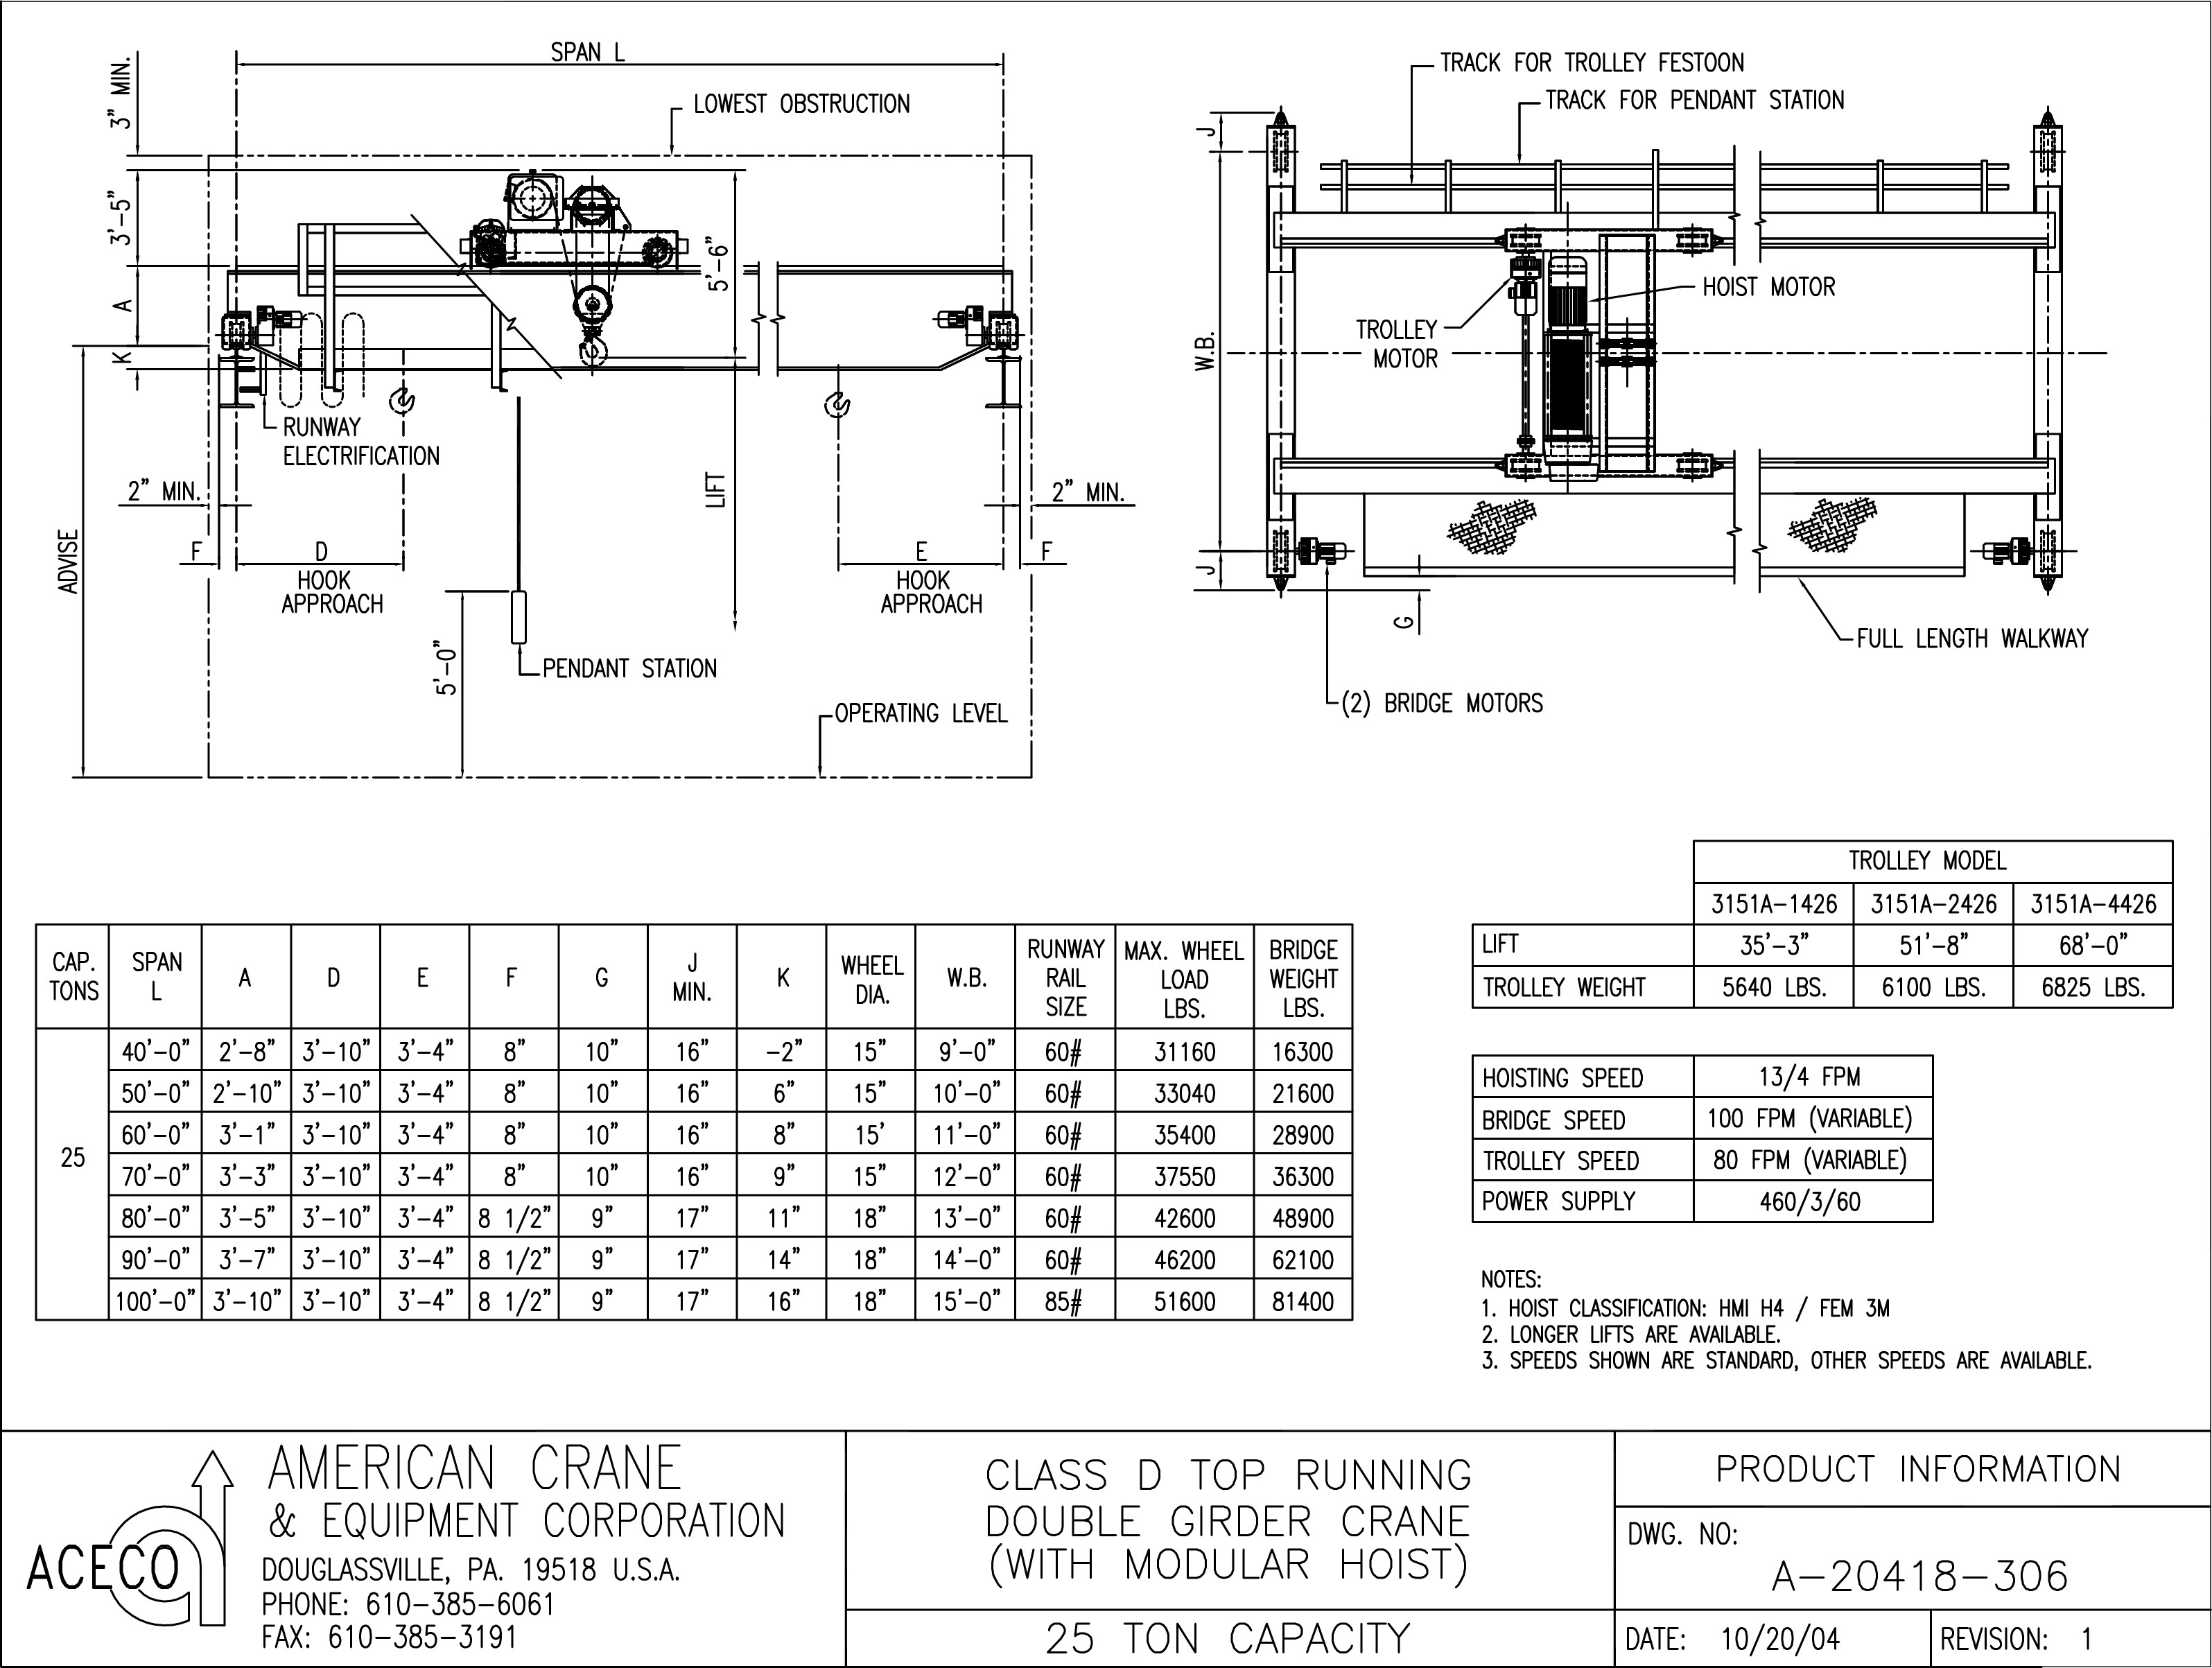 Product Code 2568.0TRW4, Top Running Double Girder Crane - and ...